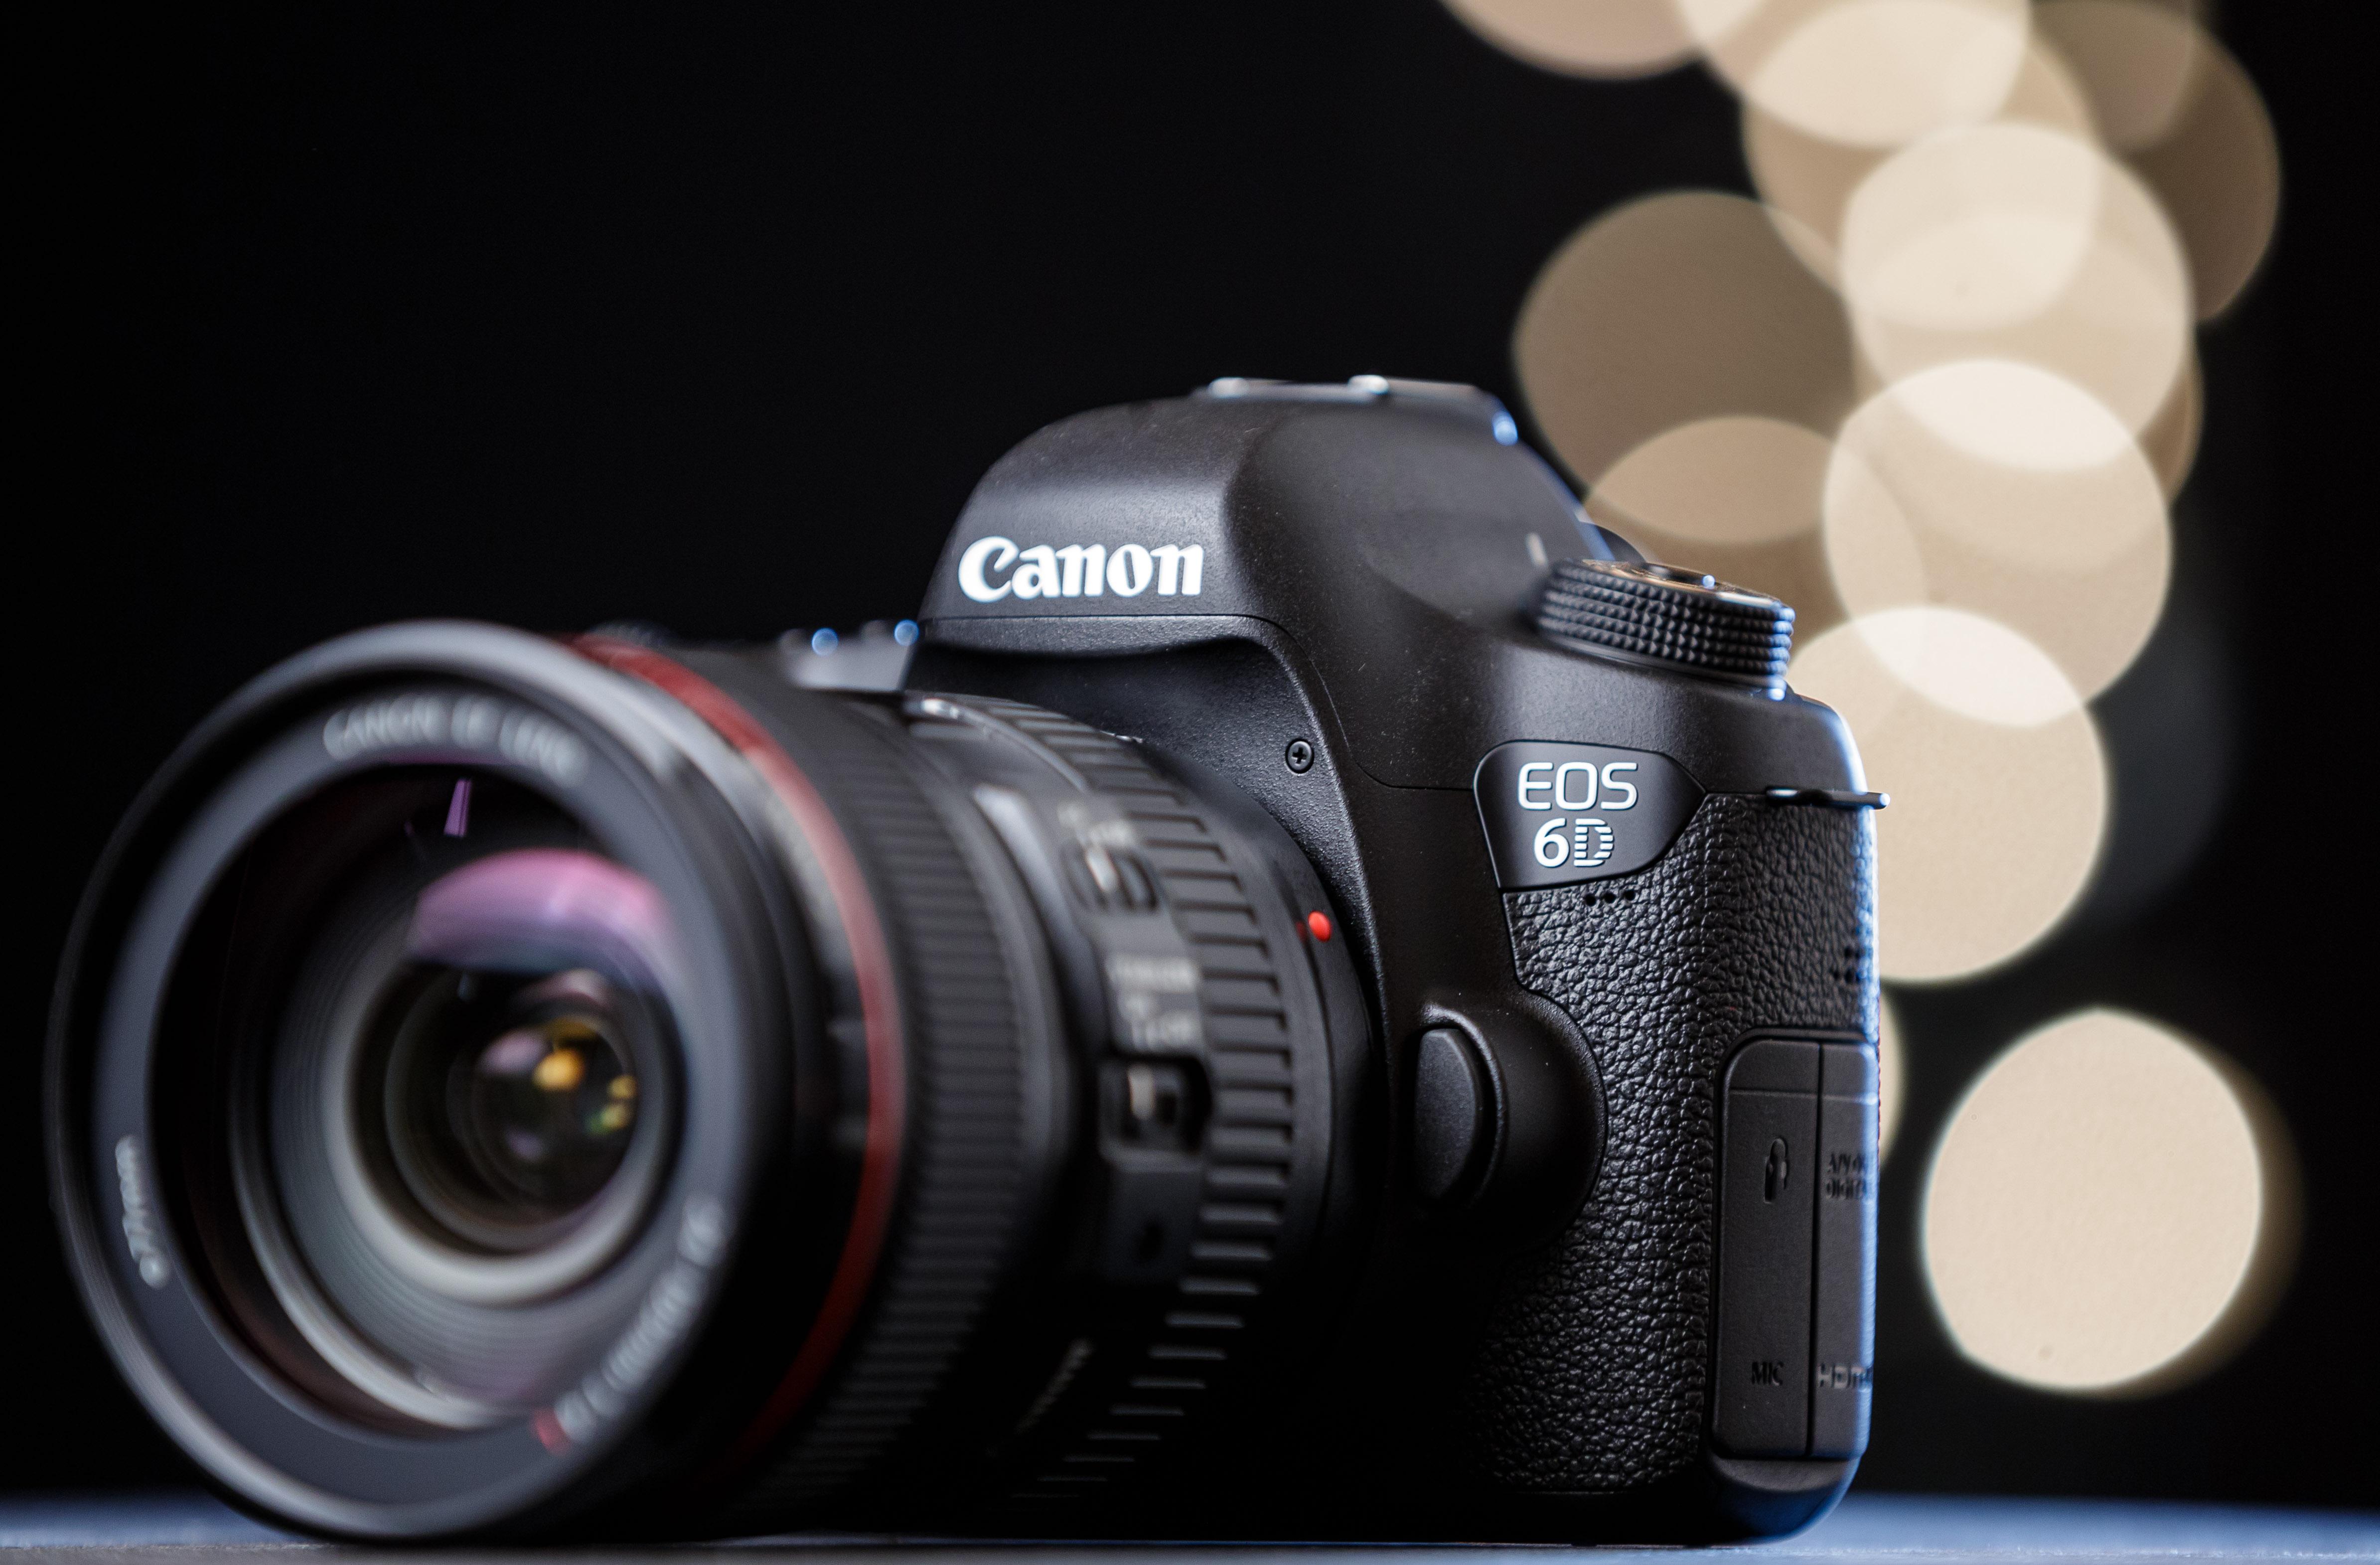 Canon_EOS_6D_digital_SLR_camera